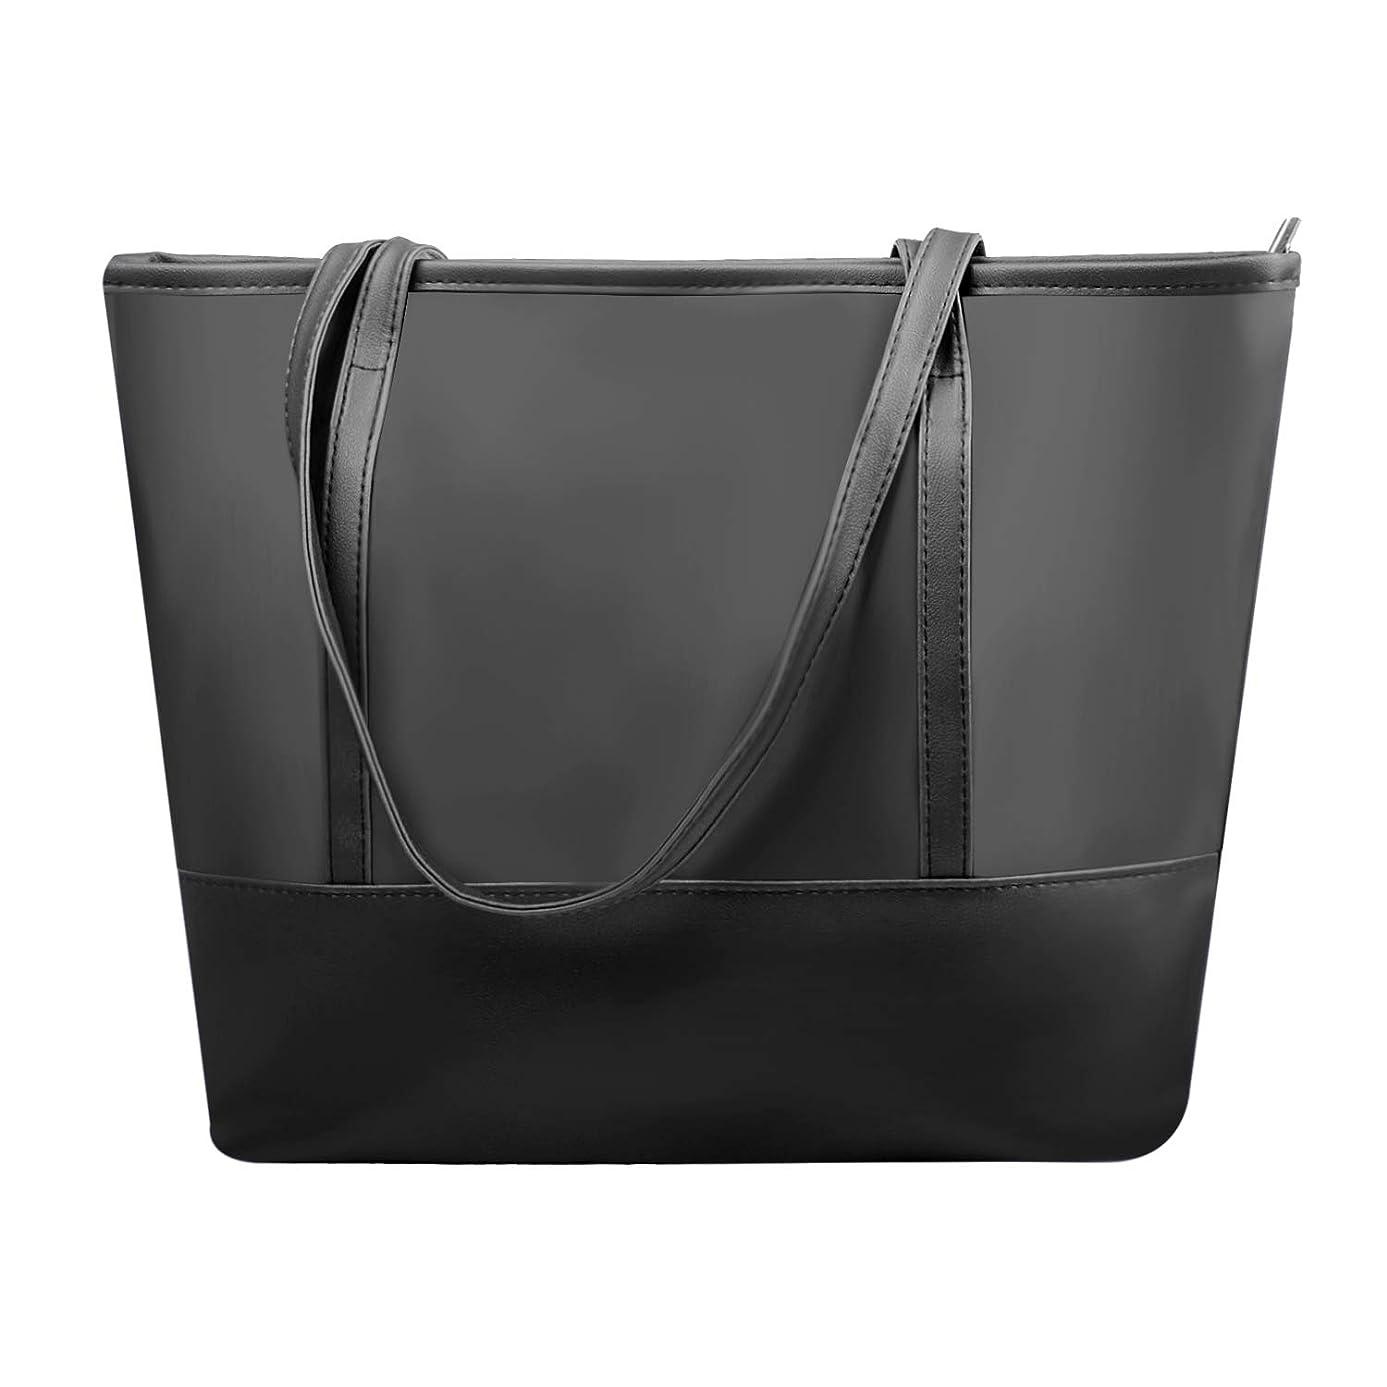 ZTOZ Laptop Tote Bag,Fits 14 Inch Laptop,Womens Lightweight Water Resistant Nylon Tote Bag Shoulder Bag (Black)